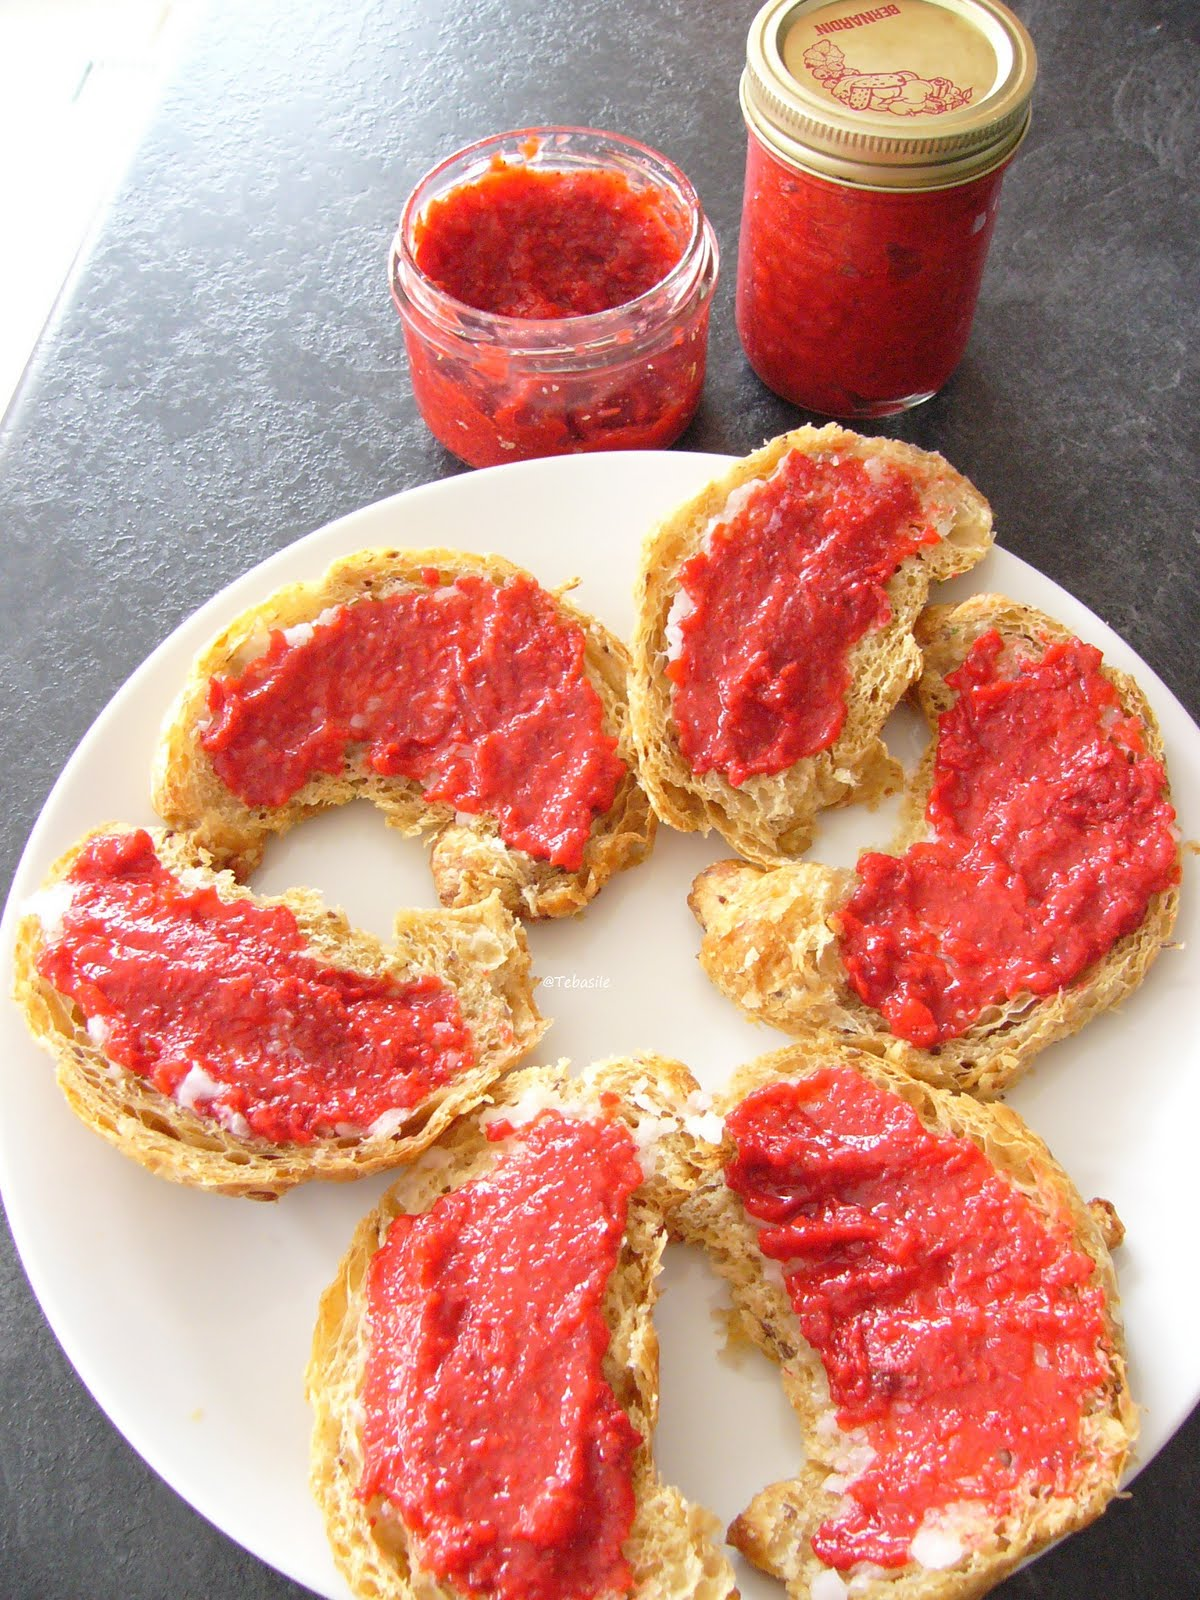 Tebasiles Kitchen: Dehydrated Strawberries / Jam